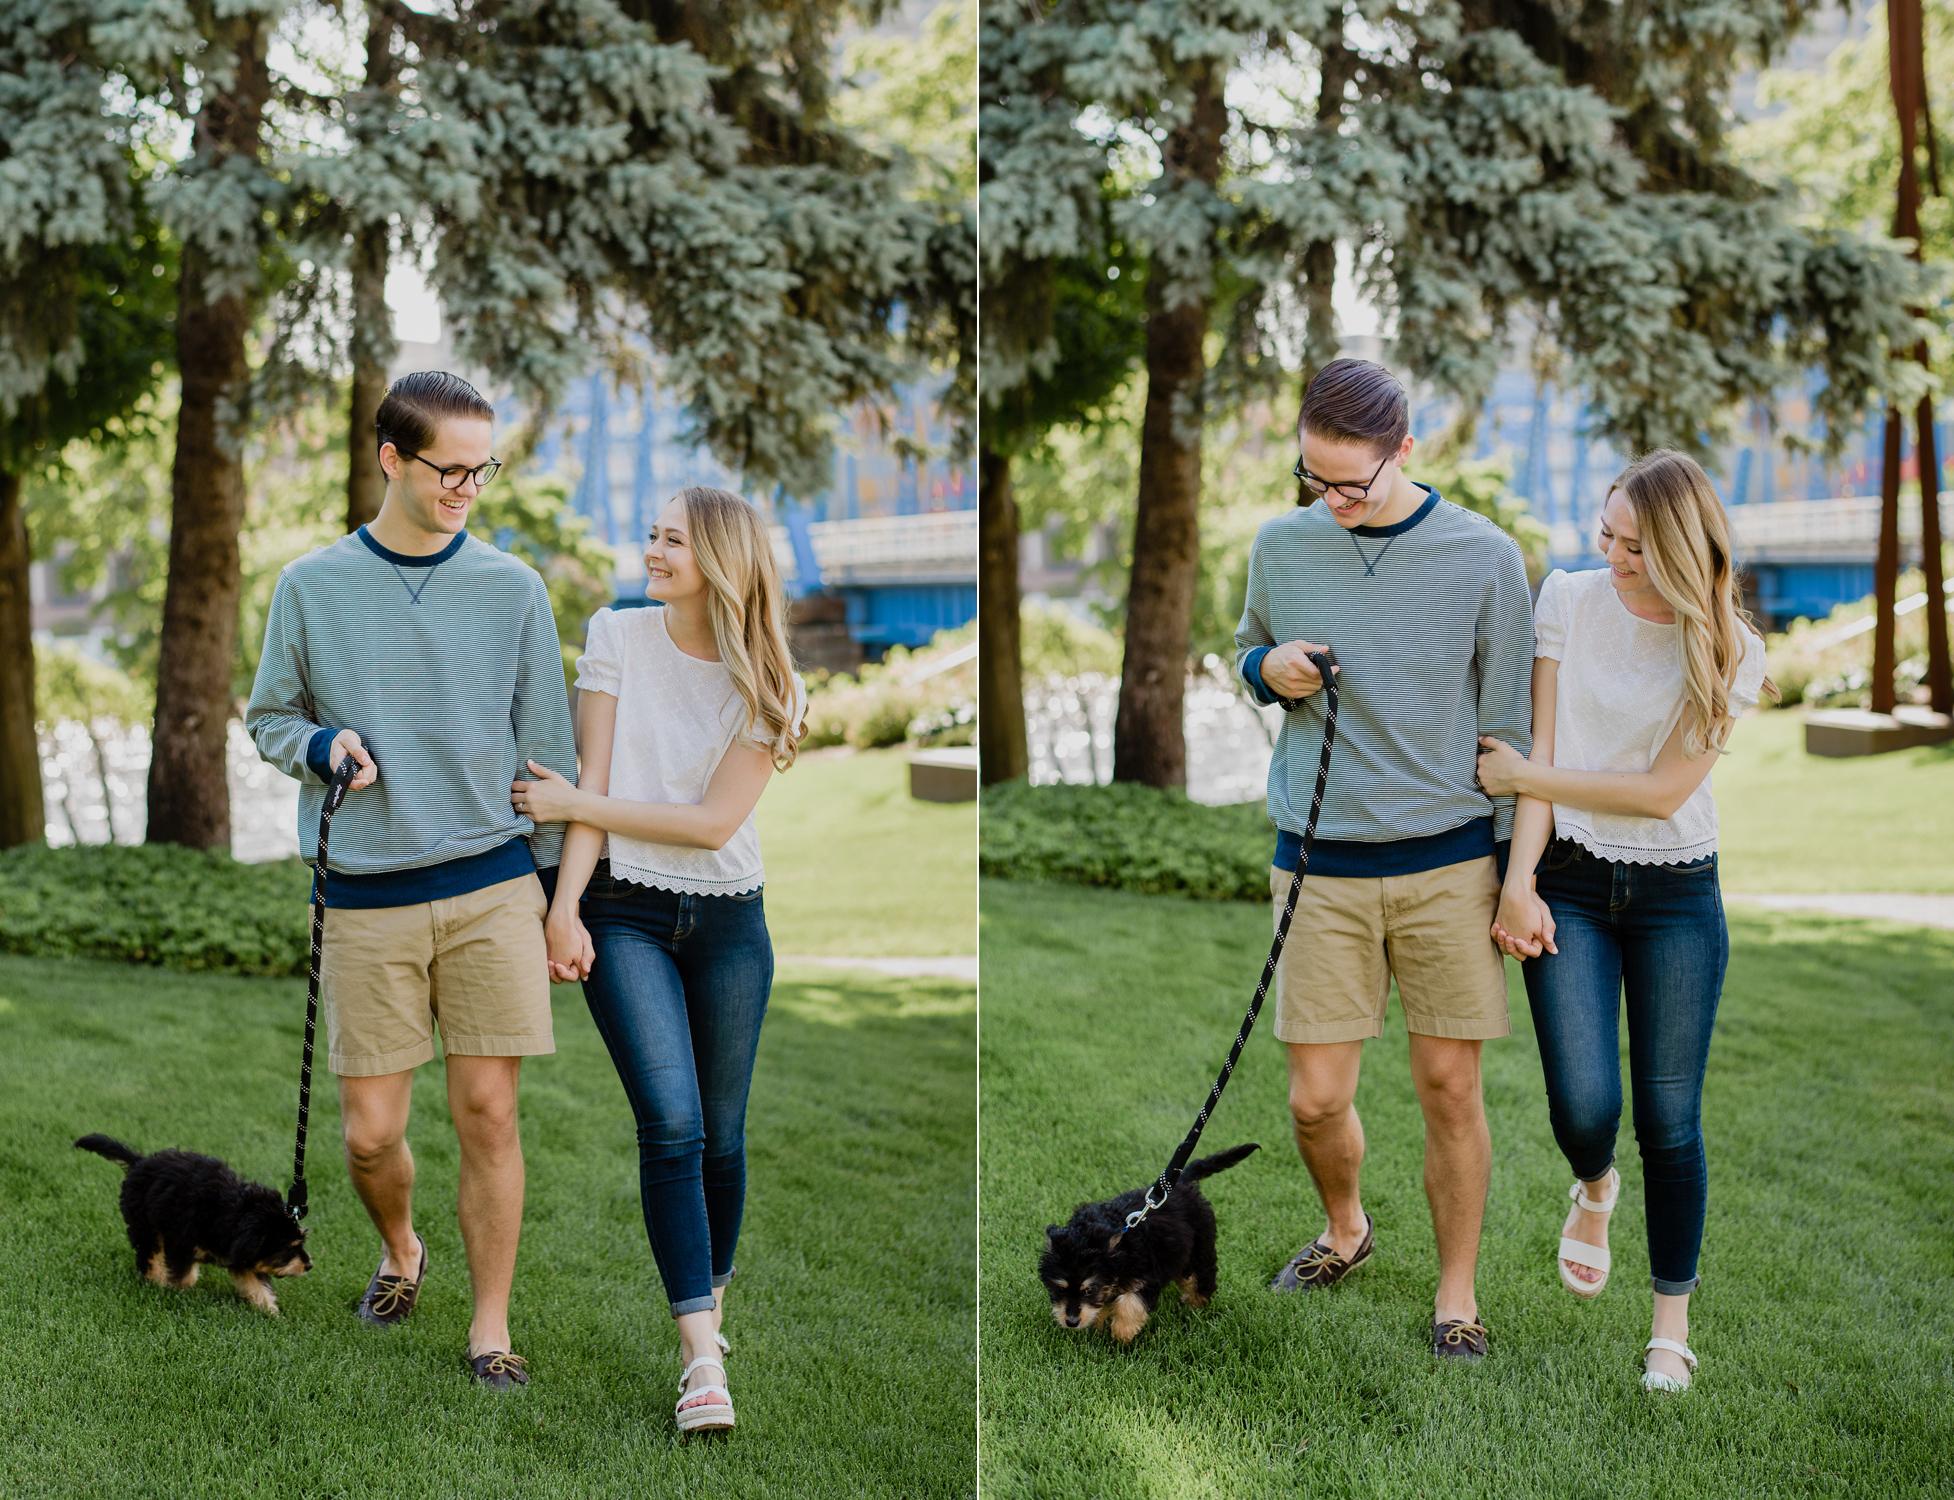 grand-rapids-michigan-engagement-with-dog (20).jpg